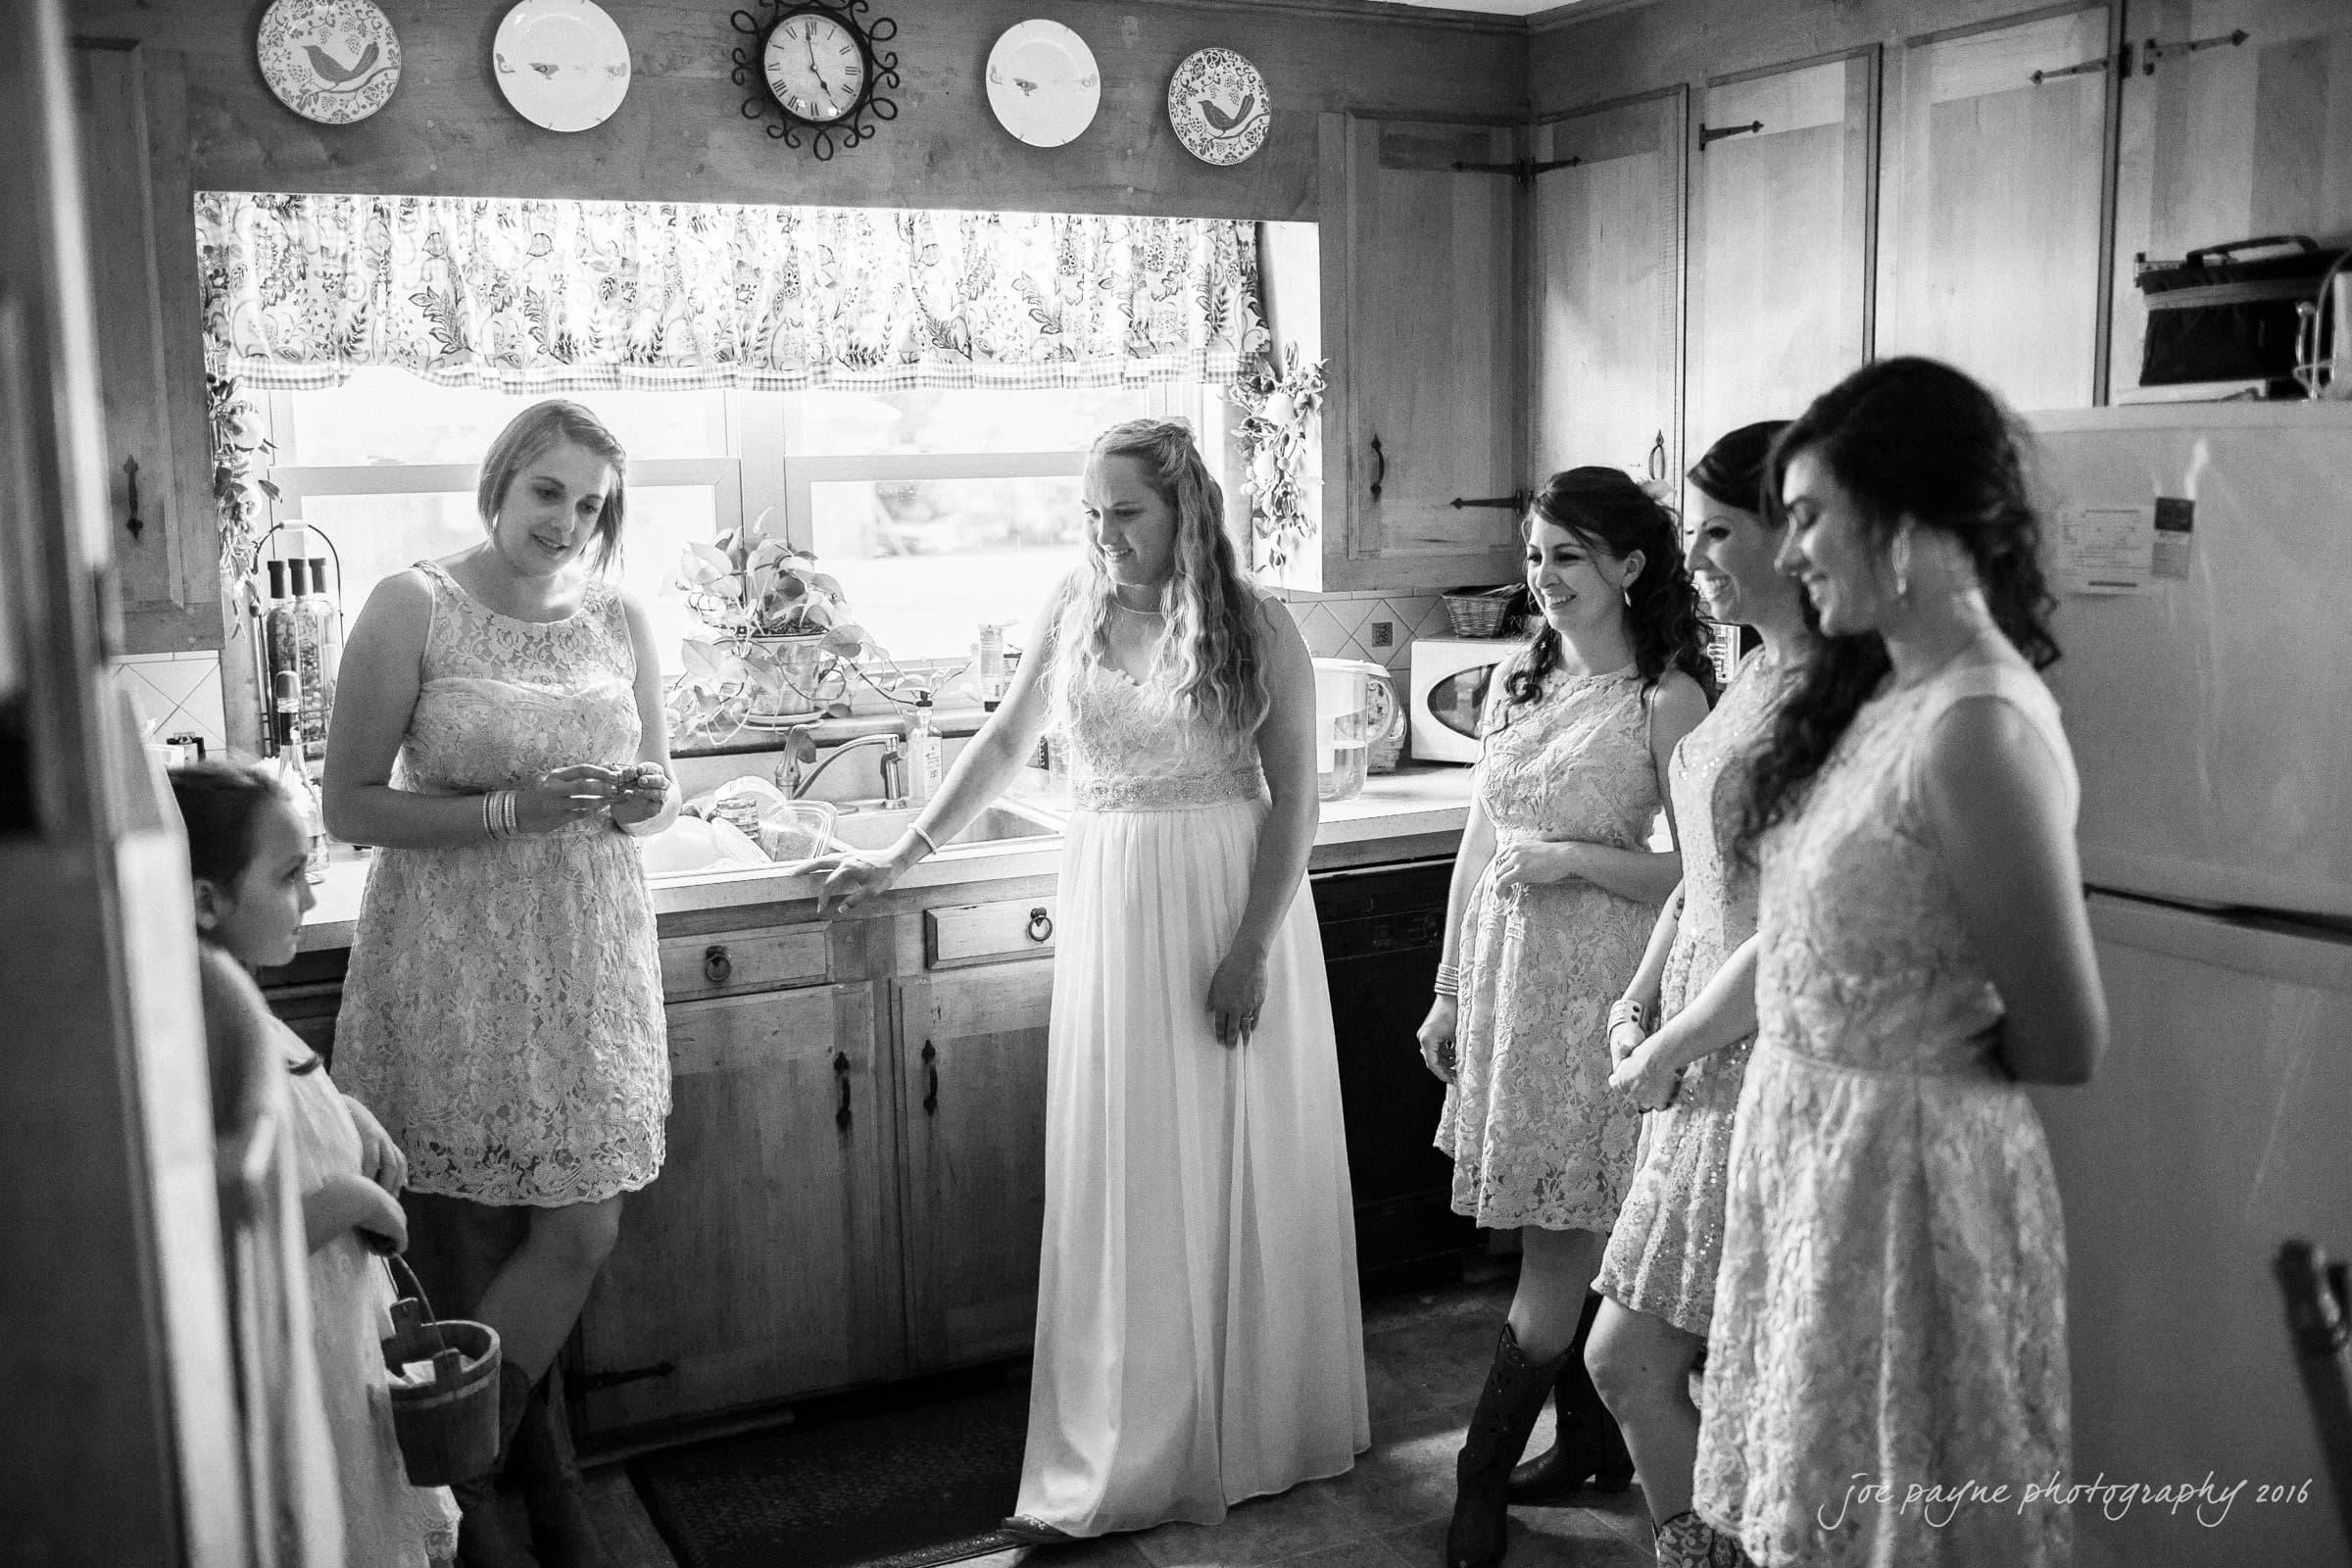 New Bern Wedding Photography - Jessica & Brinson-18